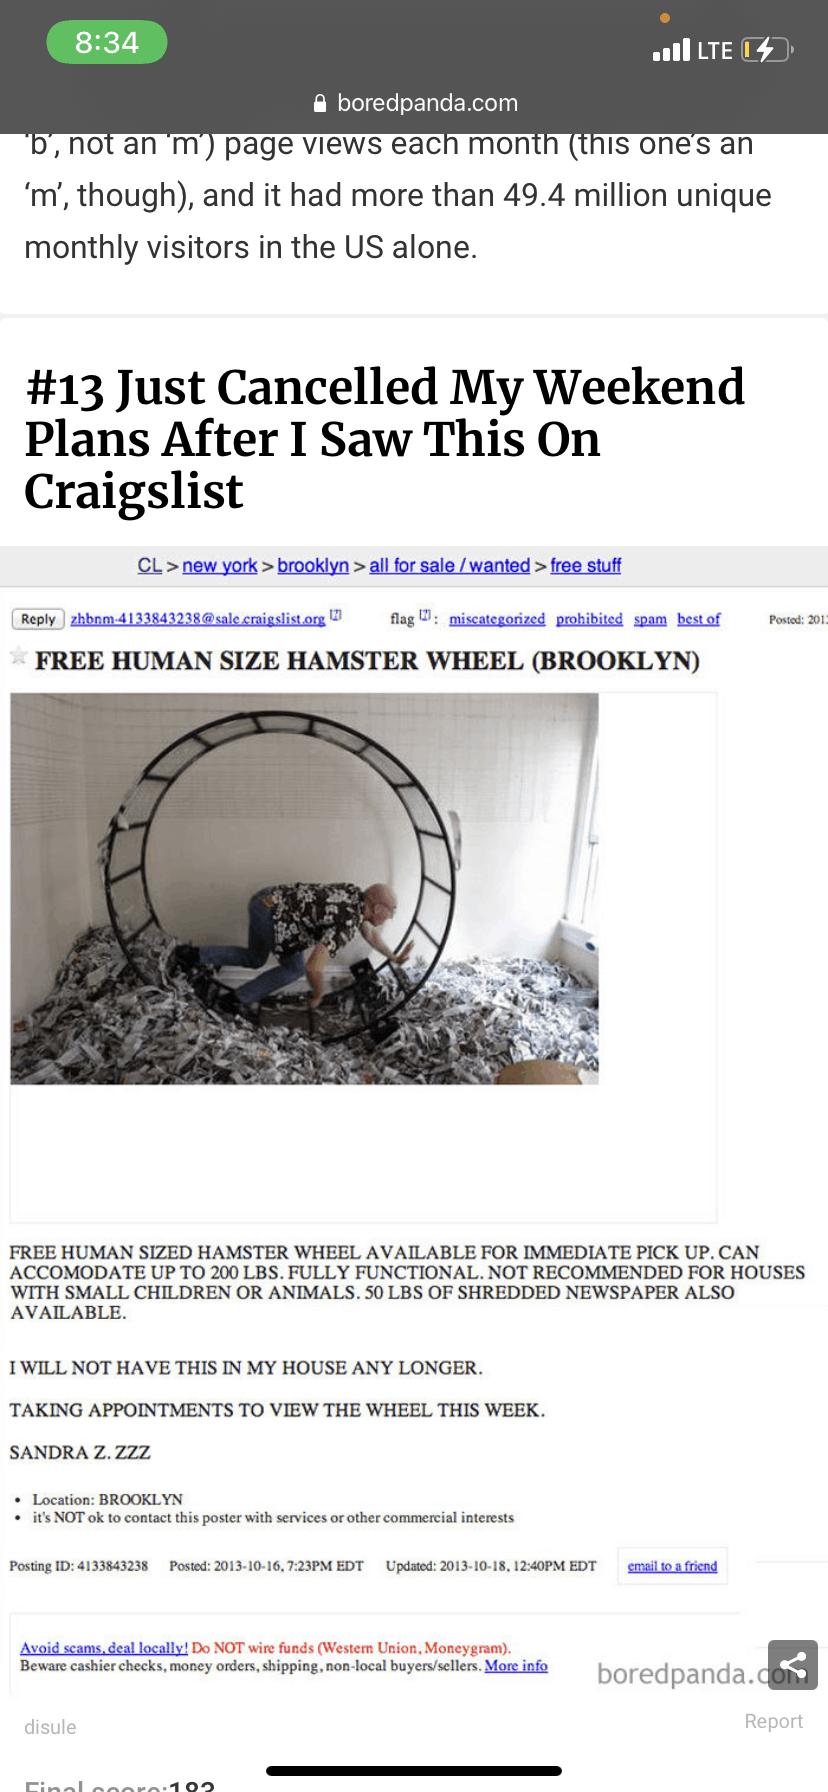 human size hamster wheel